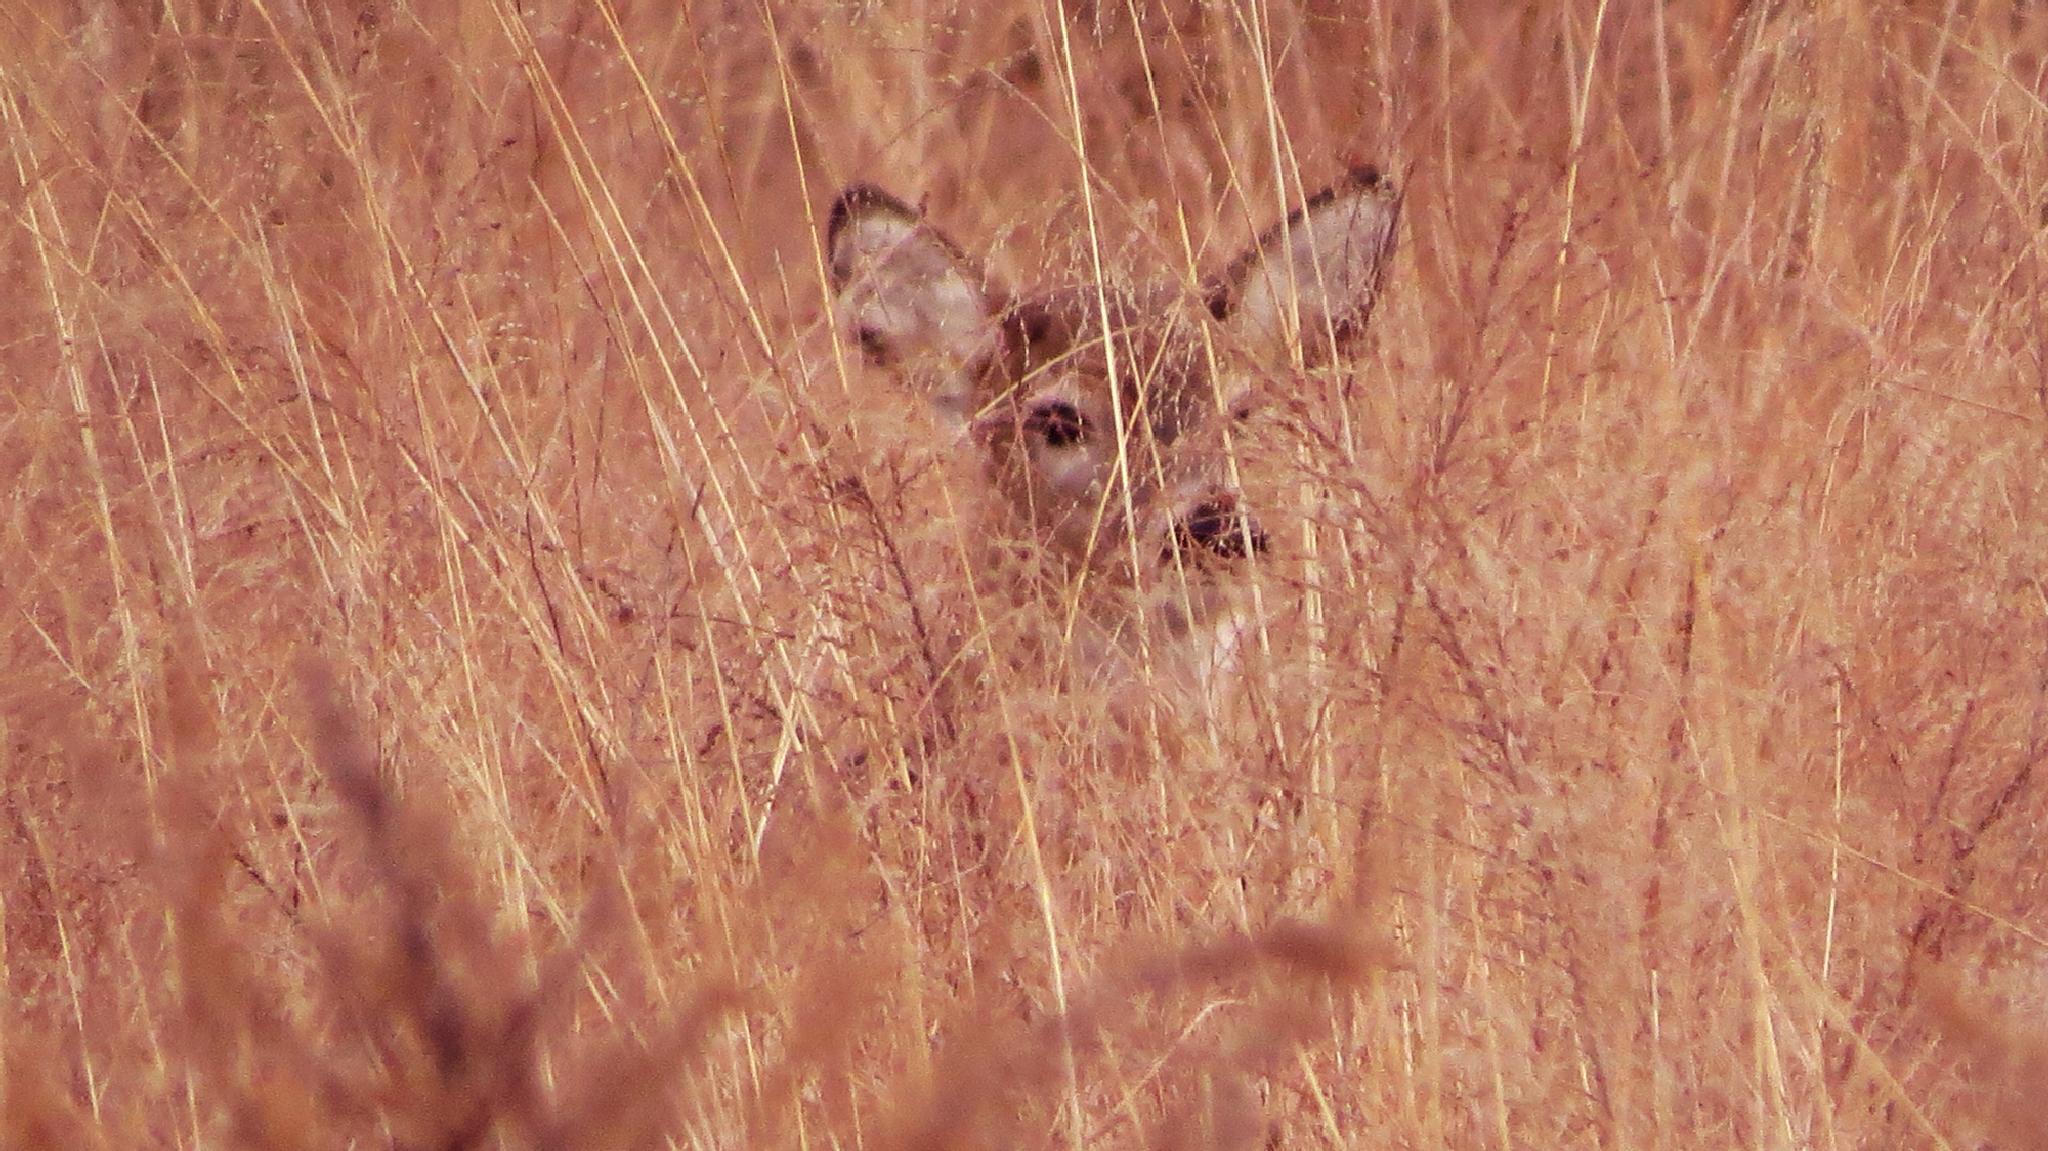 All In The Eyes 4 - Bambi Watching by Alisha Mari Crawford